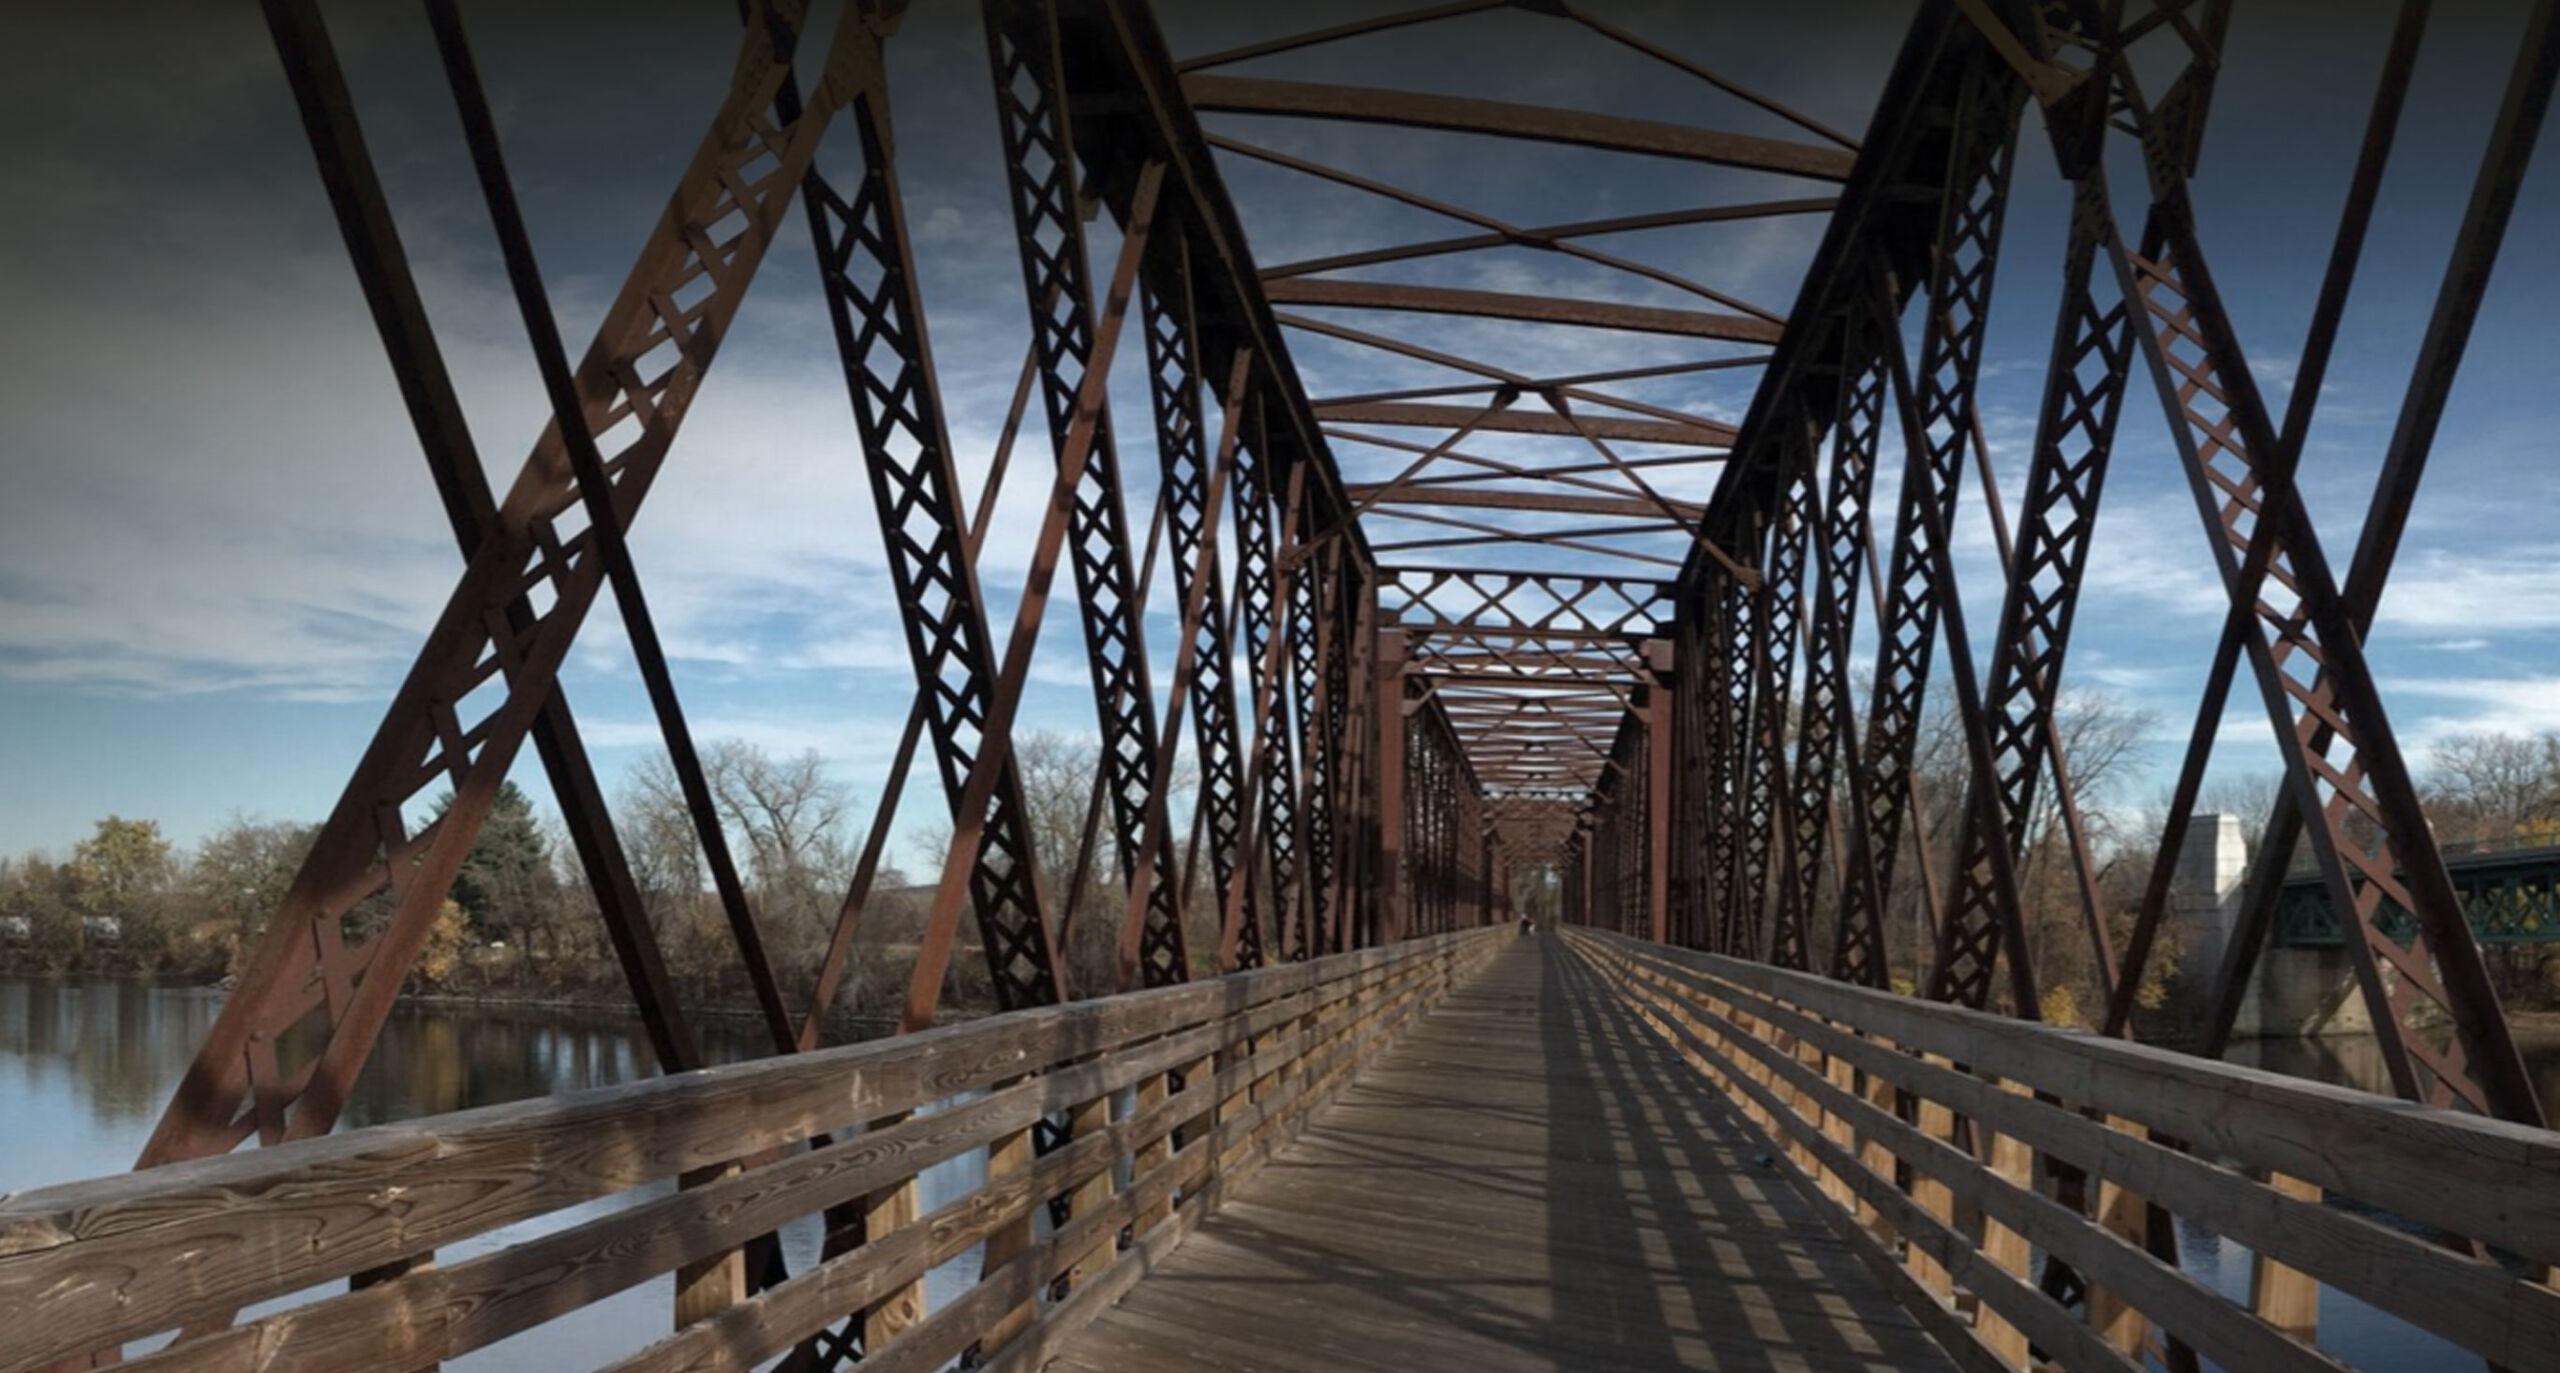 Bridge over the Connecticut River on the Norwottuck Rail Trail, Northampton, MA 01060.